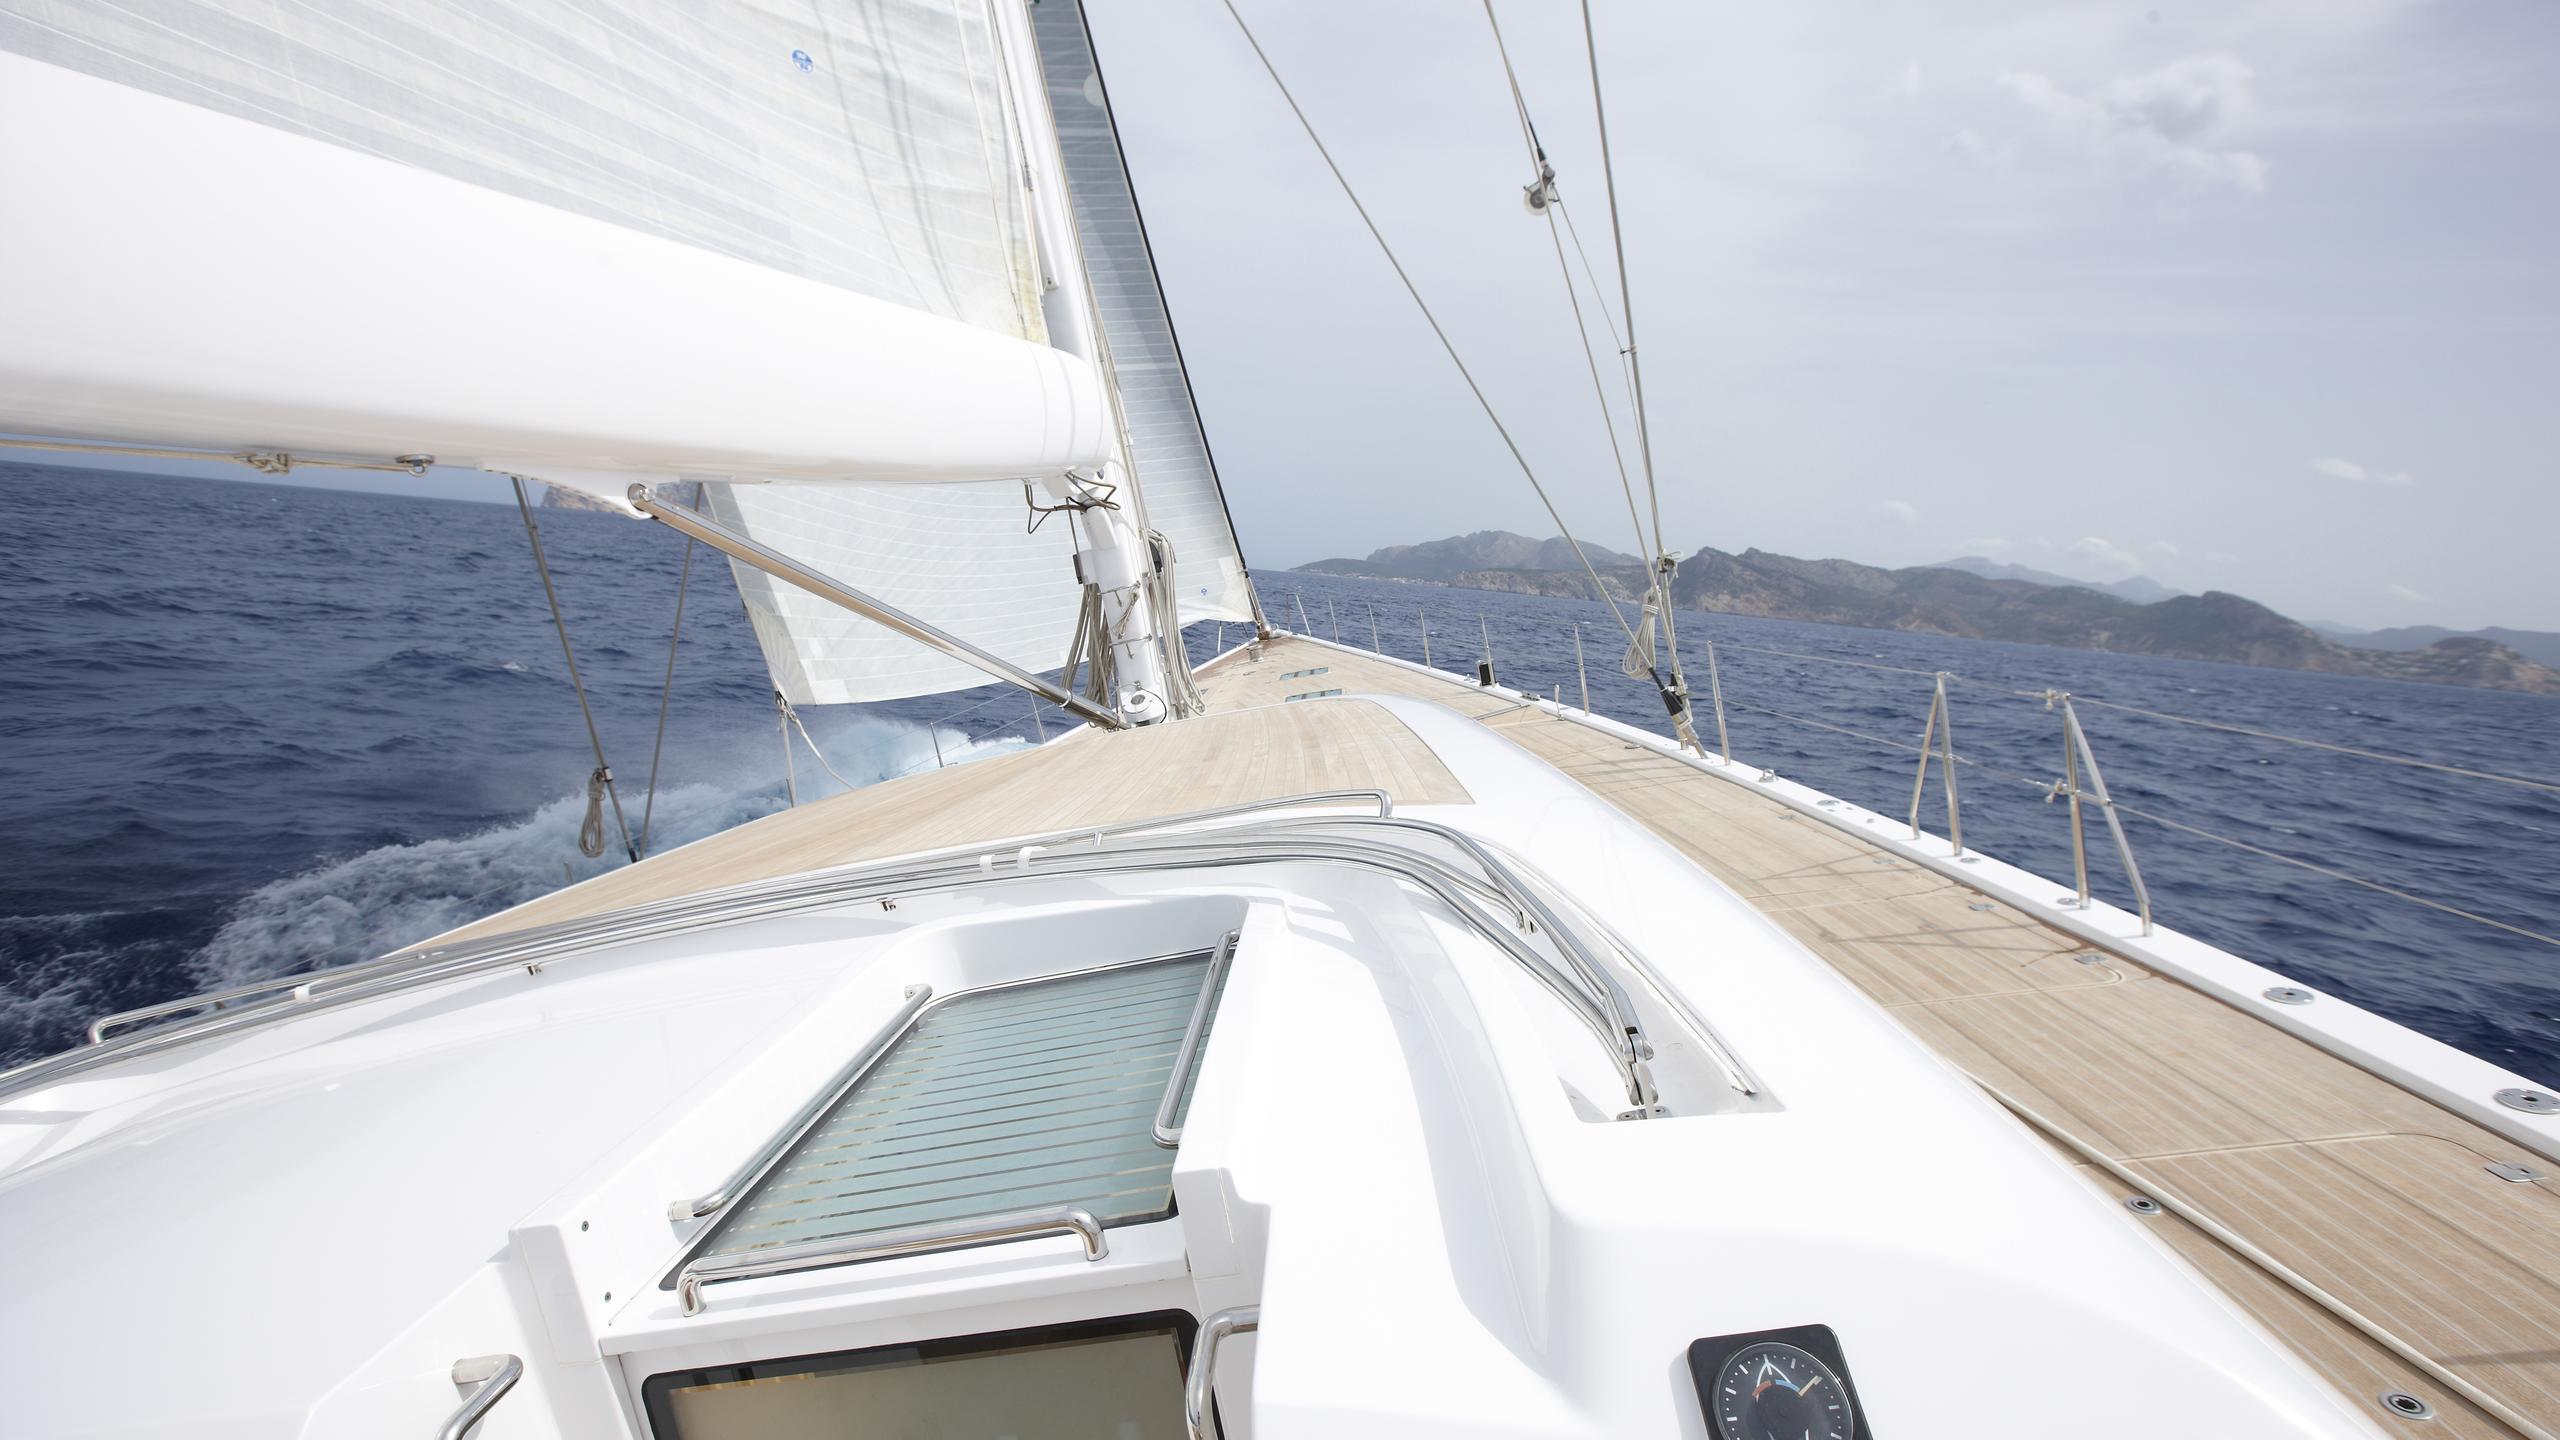 unfurled-yacht-sailing